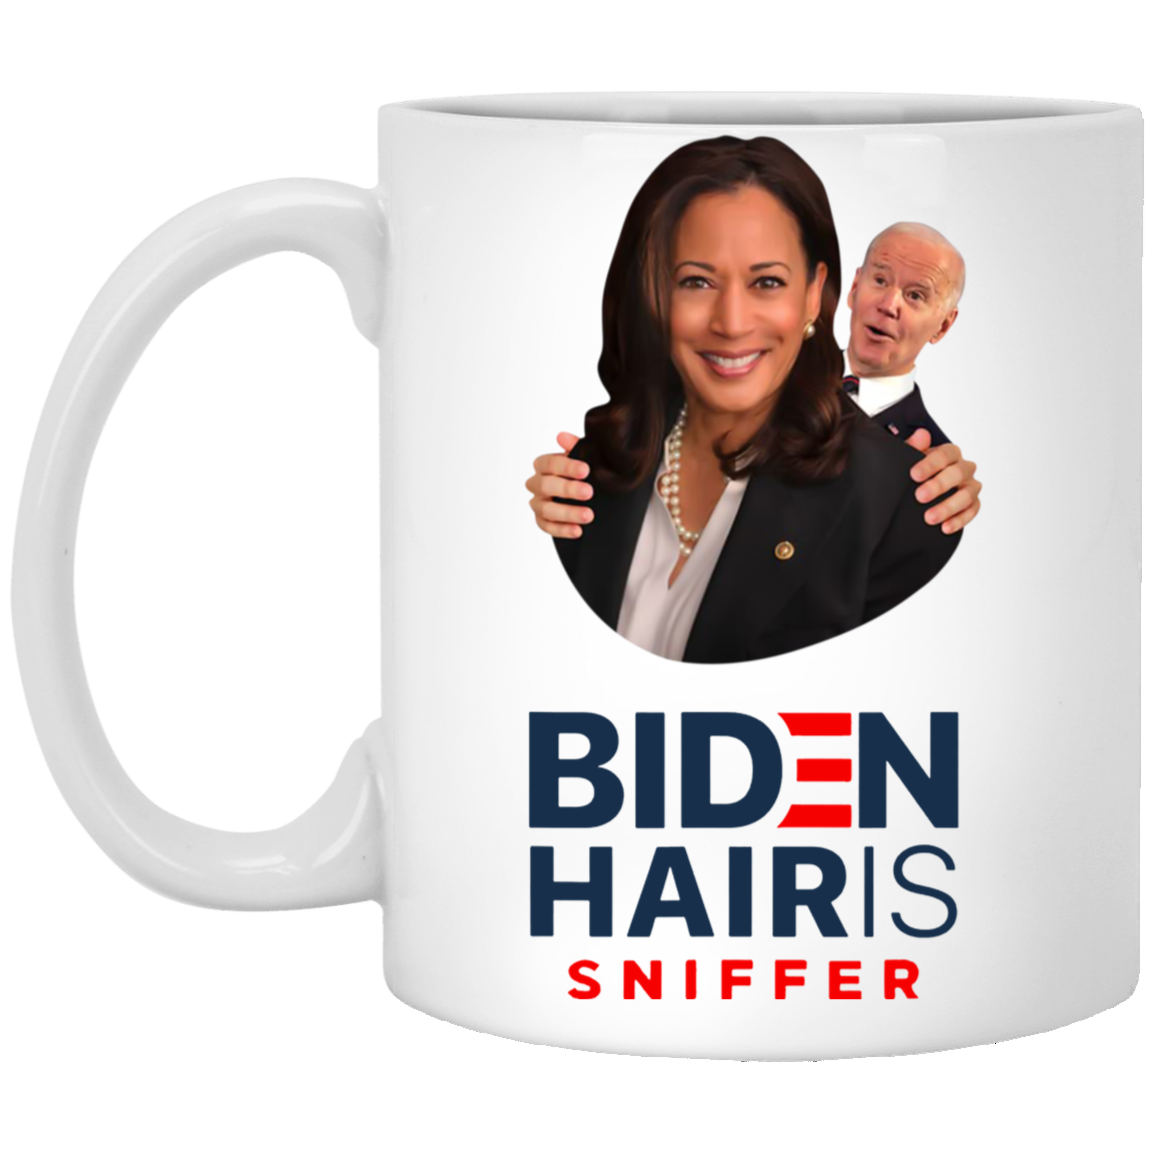 Biden Hairis Sniffer Mug Funny Biden Coffee Mug Cute Kamala Harris Campaign Parody Mug Printing Mugs Coffee Mugs